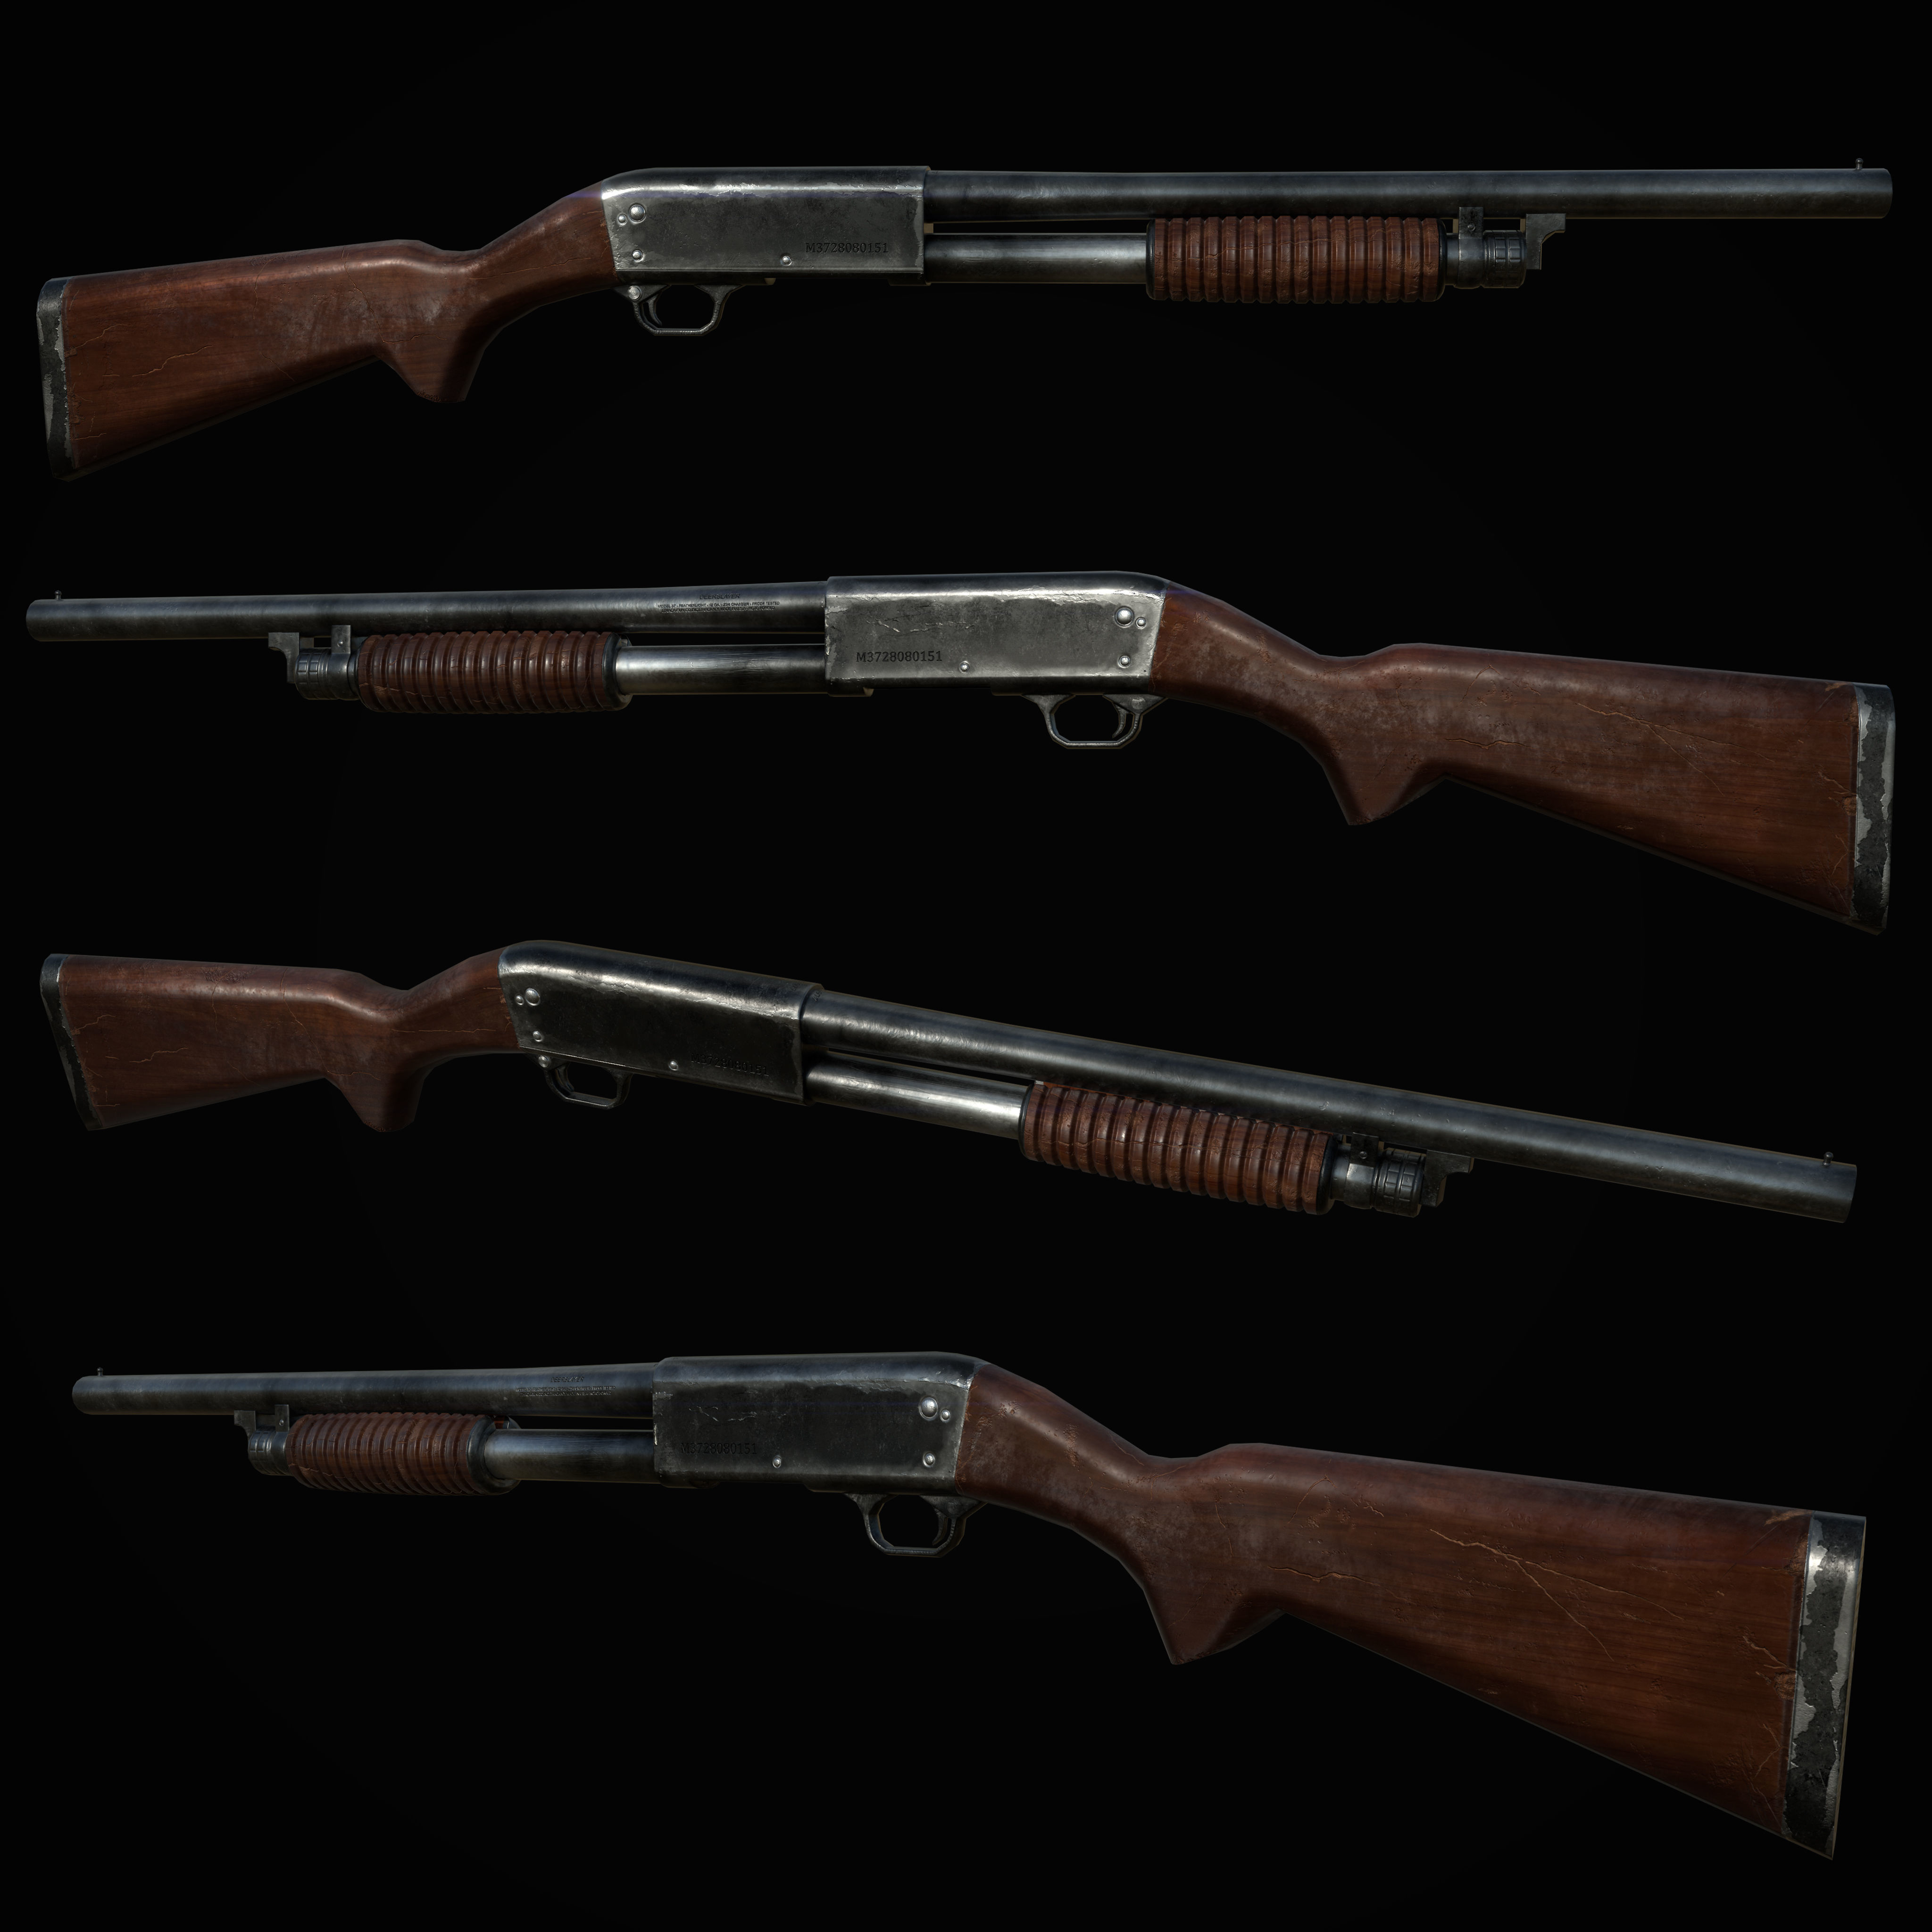 Ithaca 37 Shotgun M37 PBR MODEL UNITY UNREAL ENGINE | 3D model